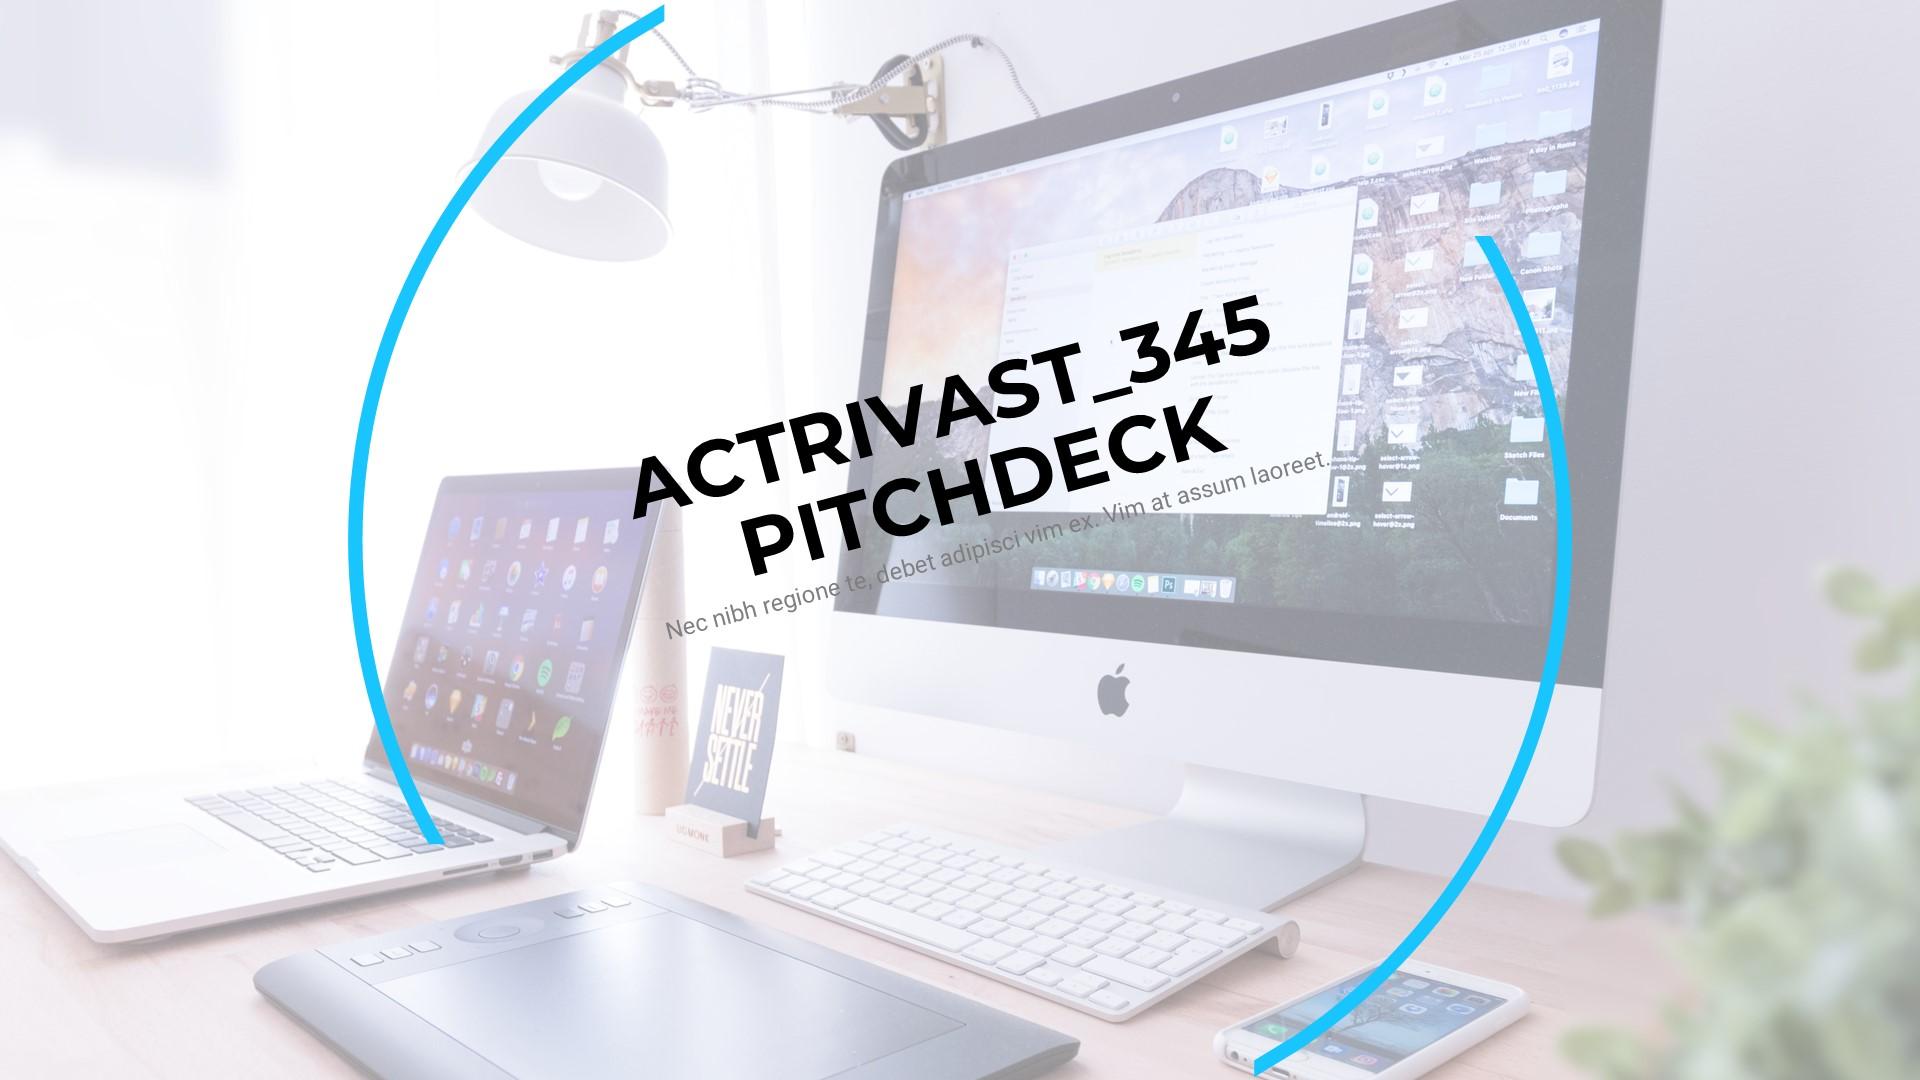 Arctivast_345 - Creative Business Google Slides - screenshot